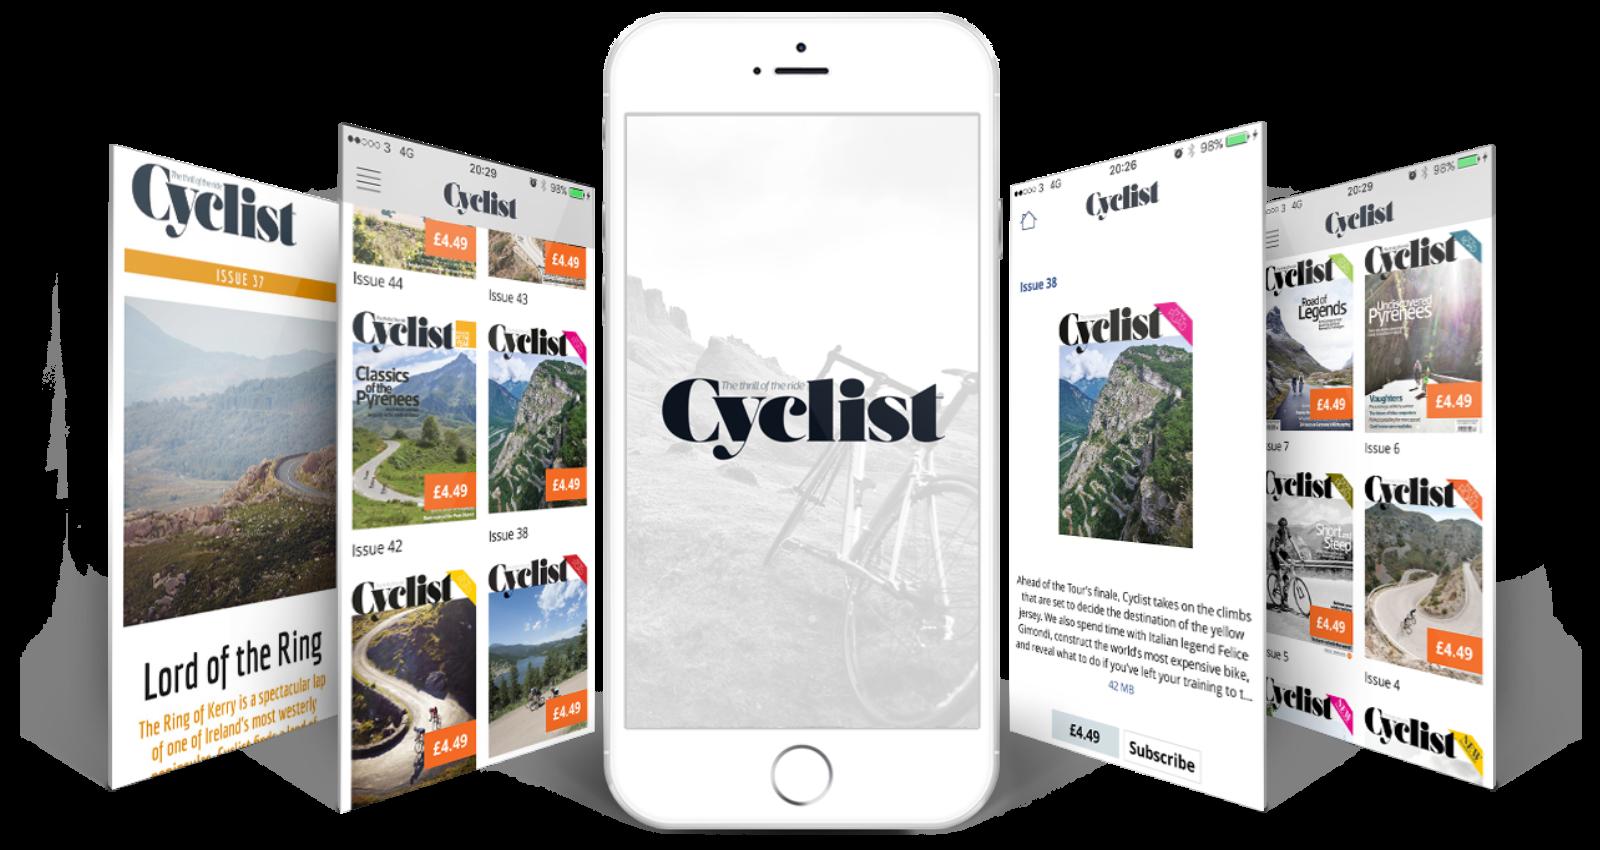 cyclist-iphone.jpg